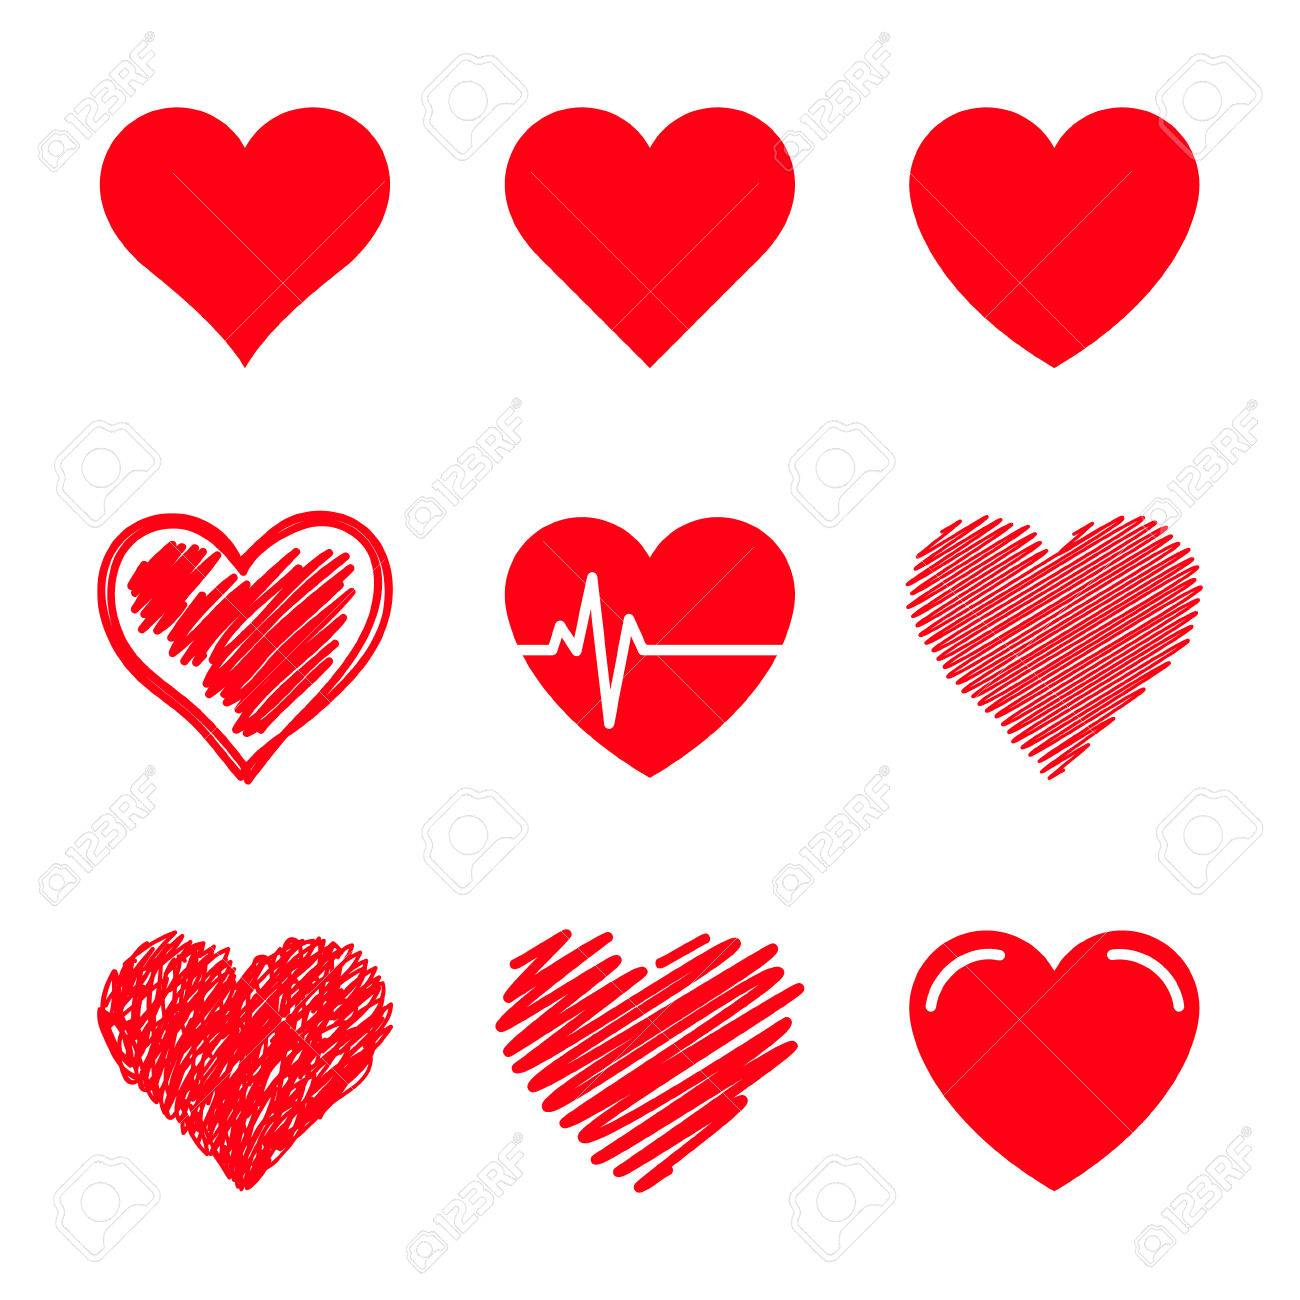 vector hearts set royalty free cliparts vectors and stock rh 123rf com vector heart art vector heart shape